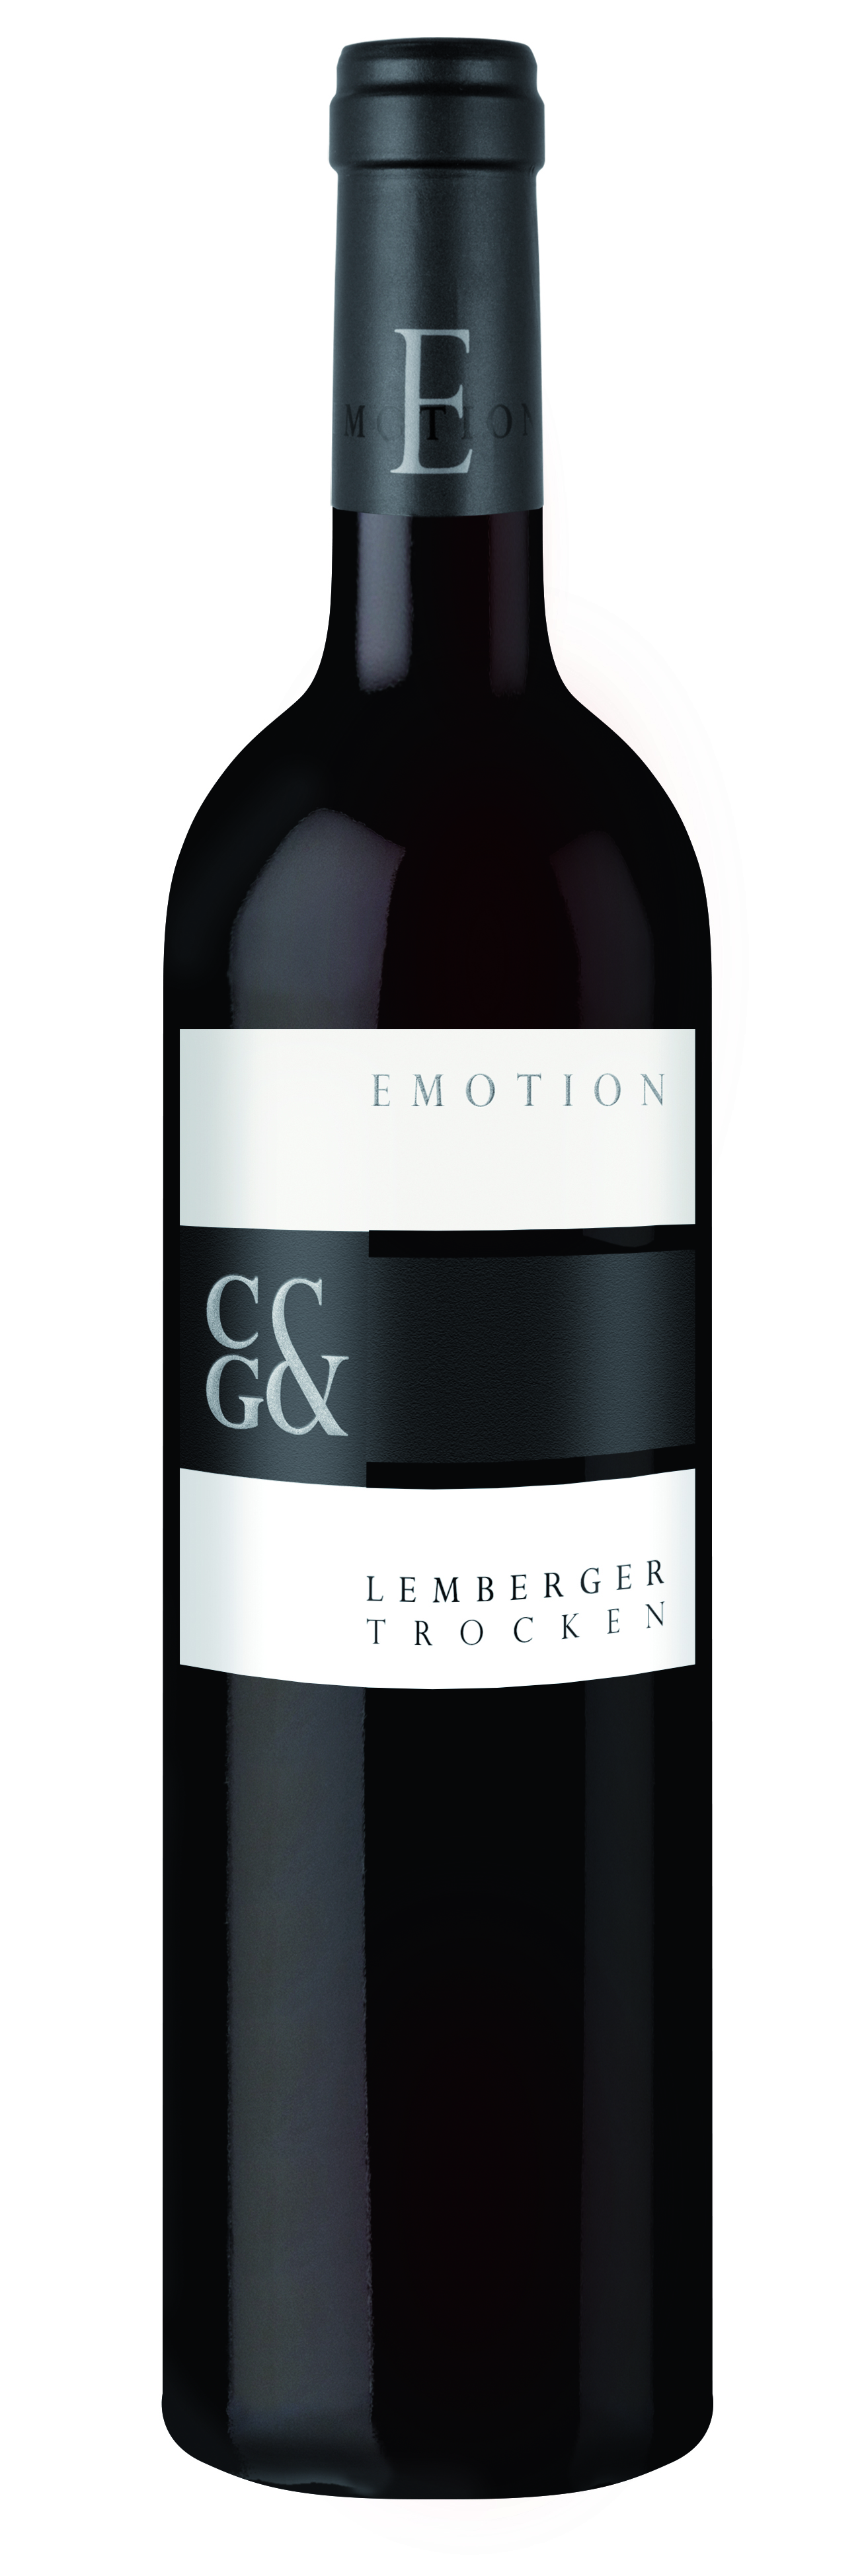 "Der 2015 Lemberger ""Emotion"" trocken der Weingärtner Cleebronn-Güglingen"